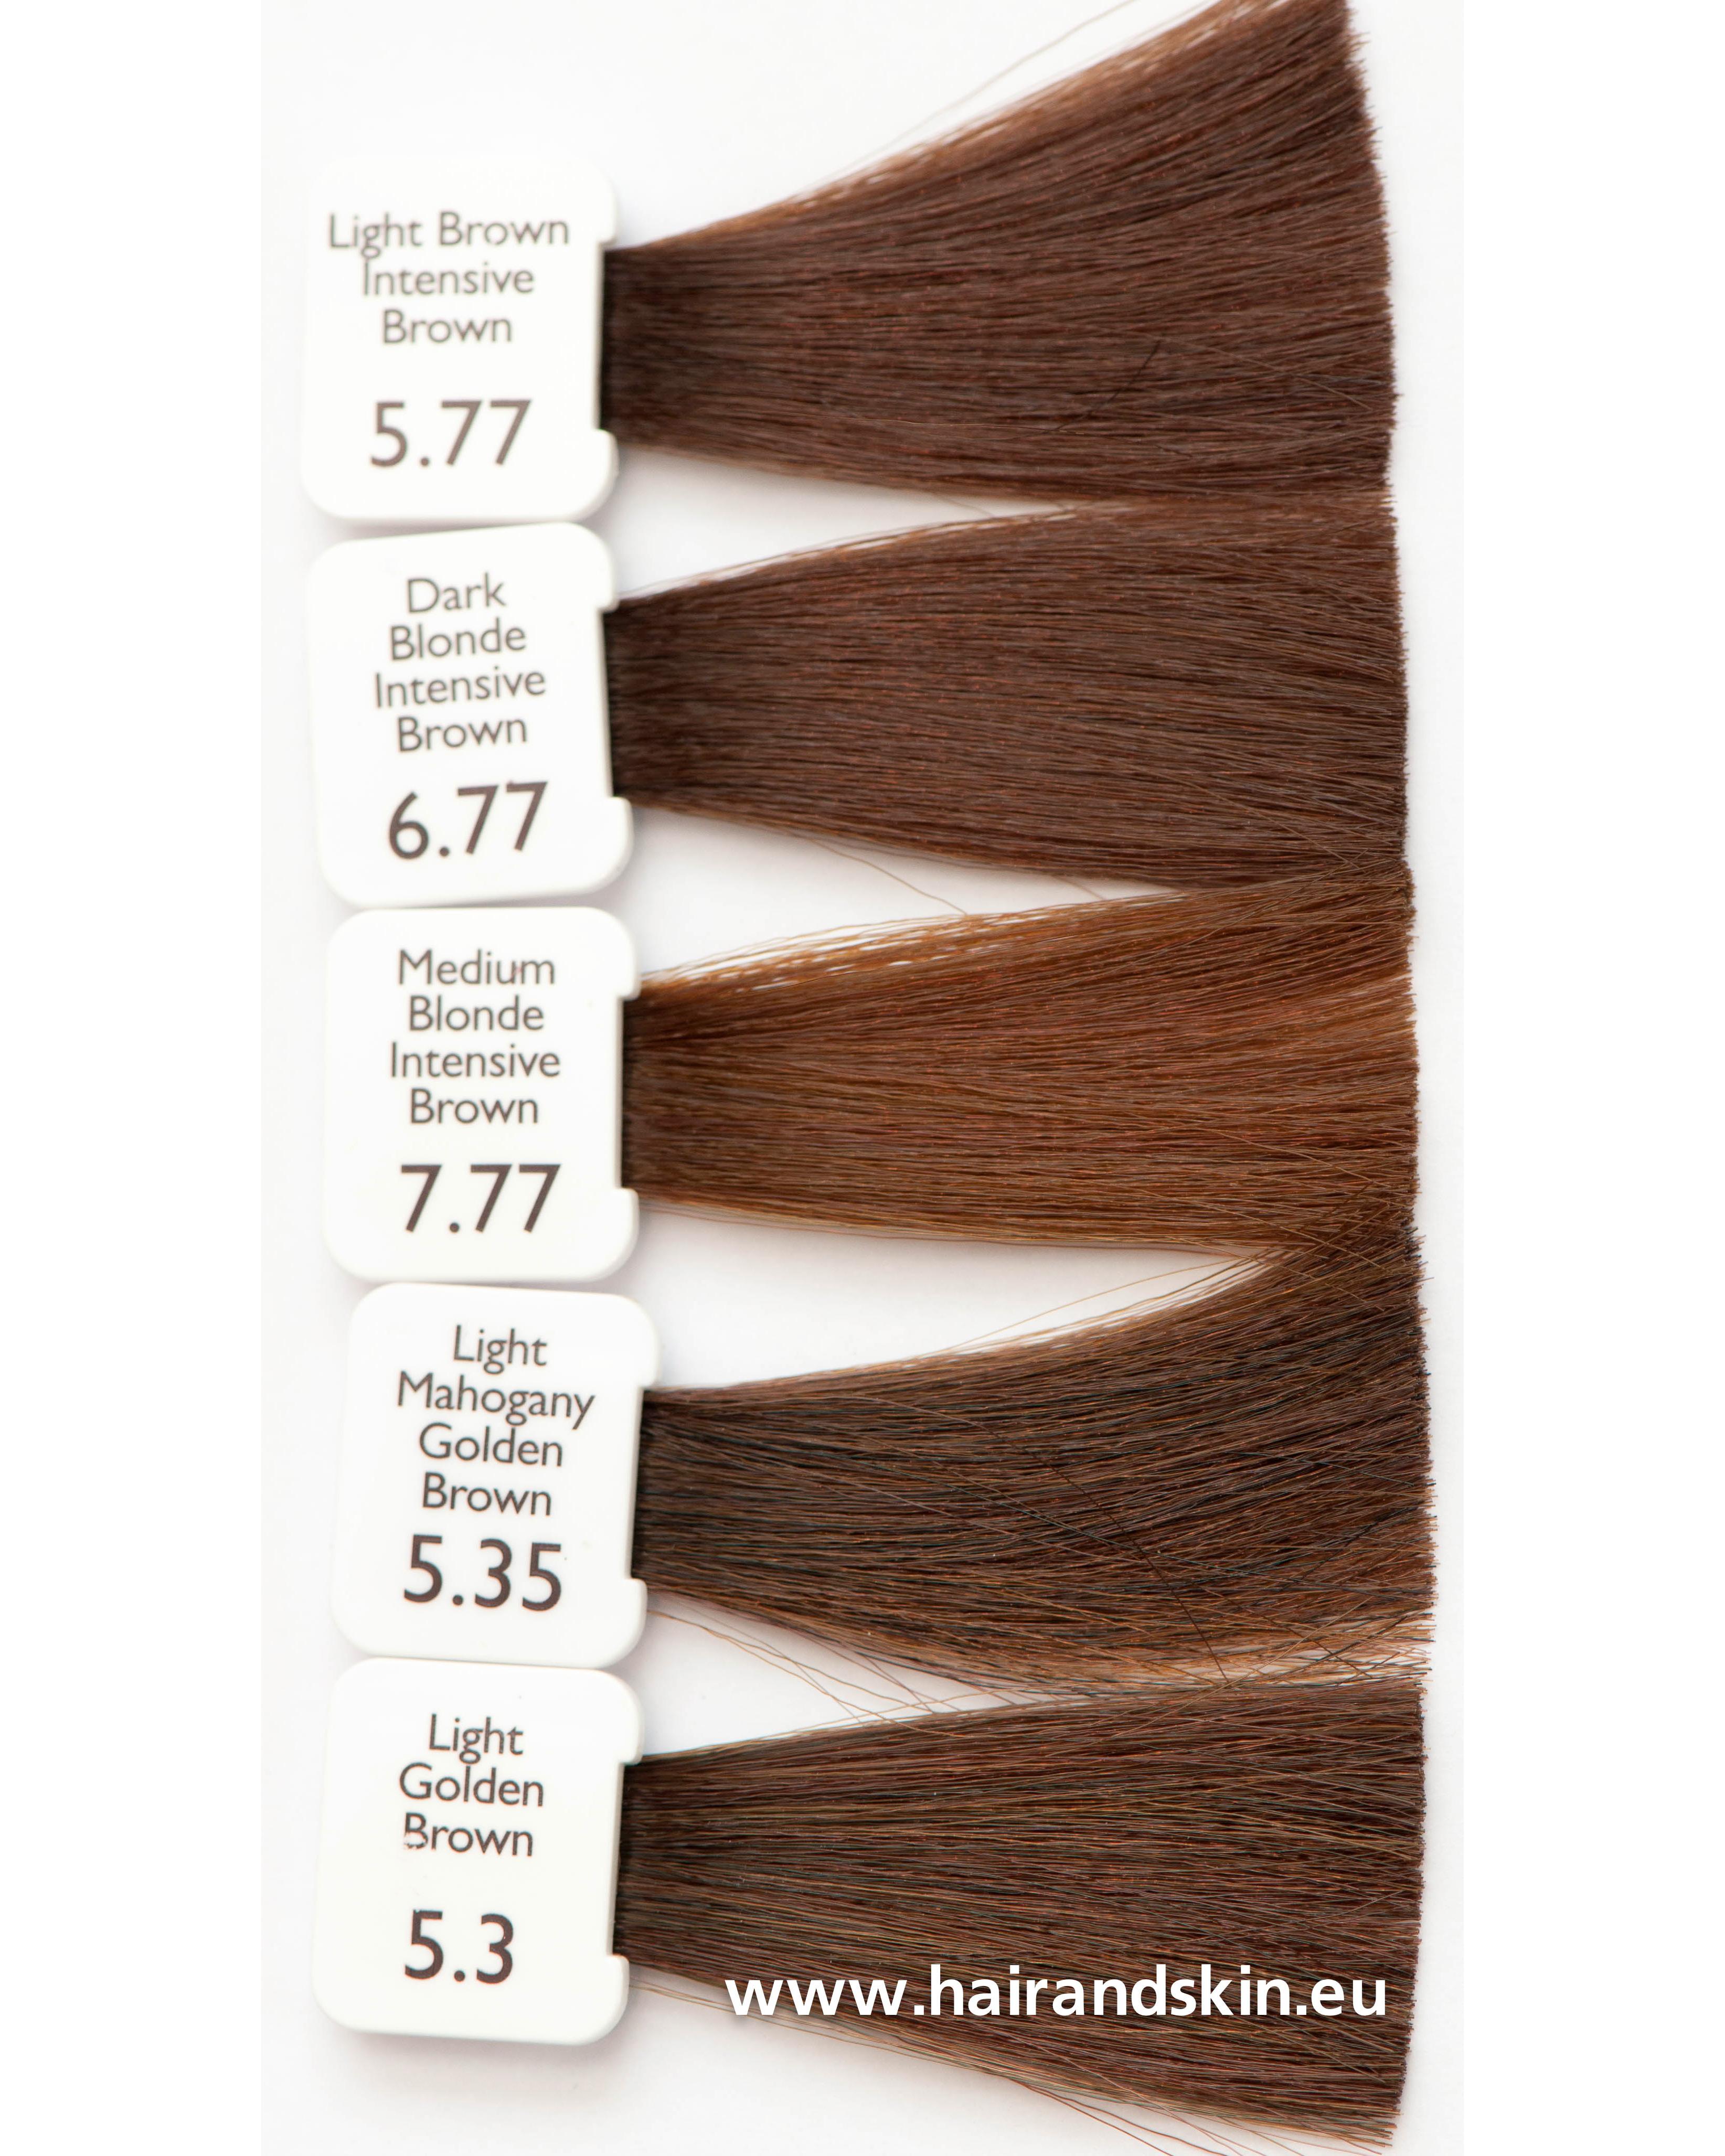 coloration natulique blond moyen brun intense 777 crme naturelle - Coloration Blond Moyen